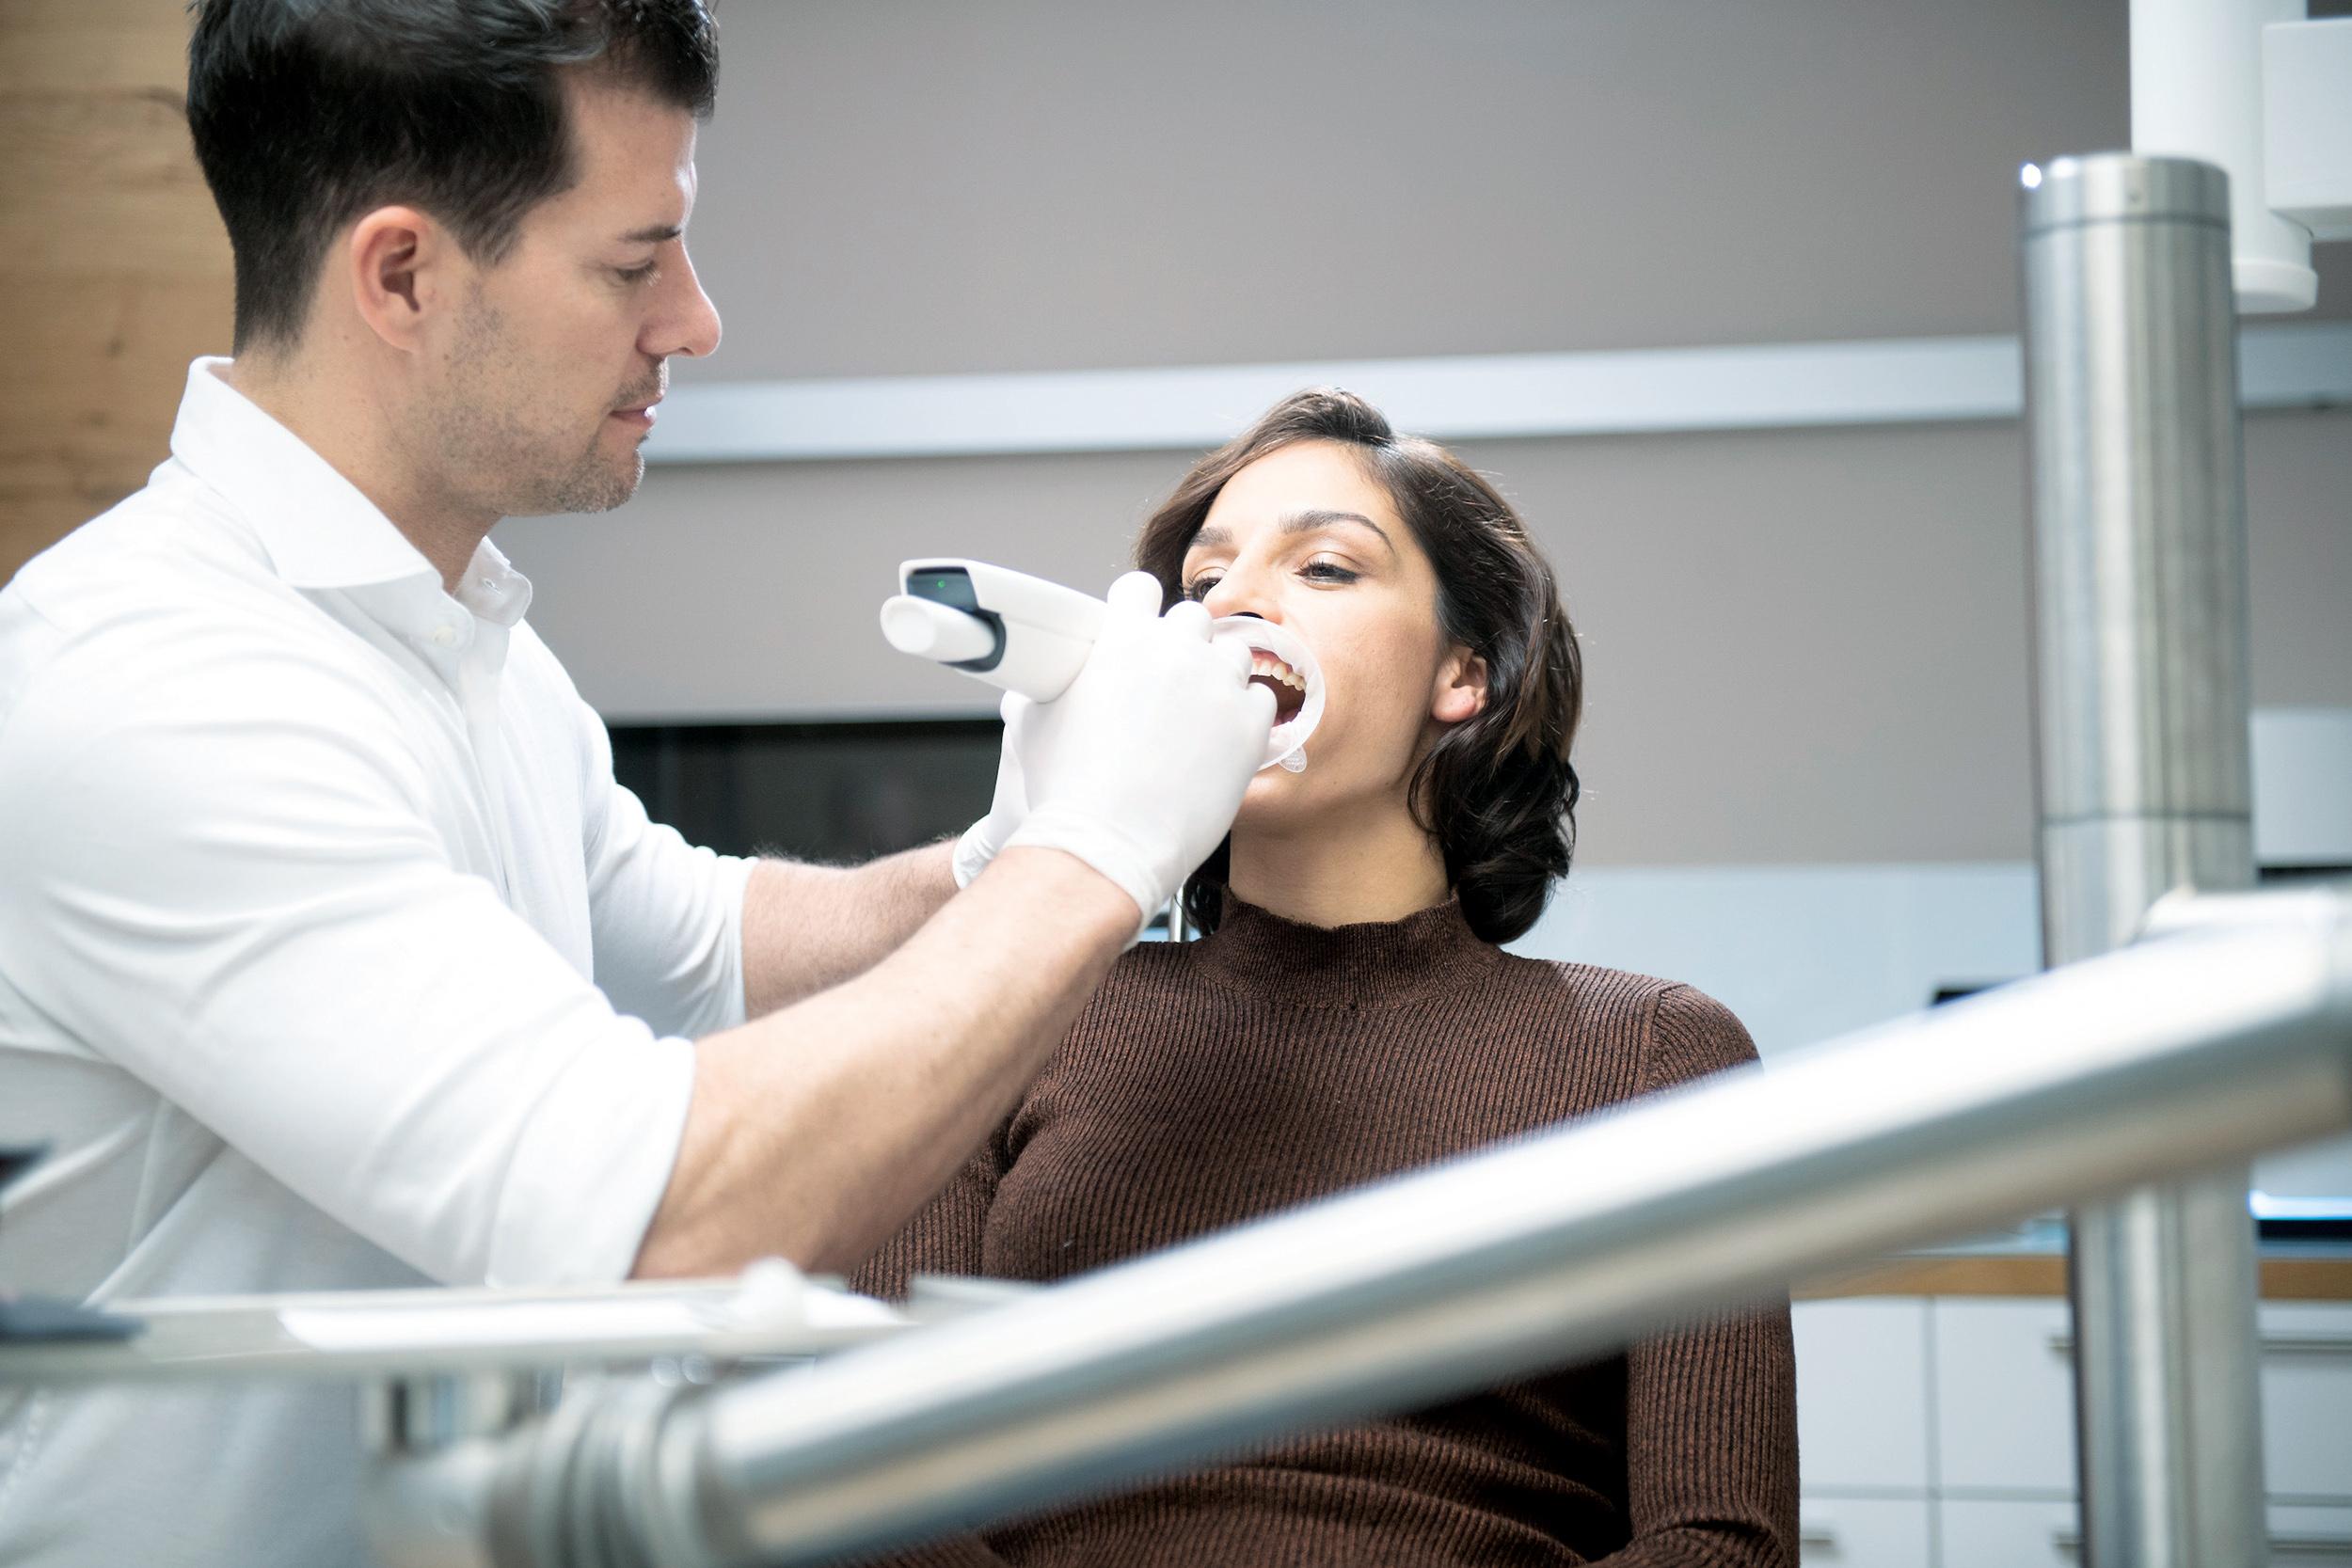 Presentamos PrograScan One: experiencia de escaneo certera con resultados de alta precisión